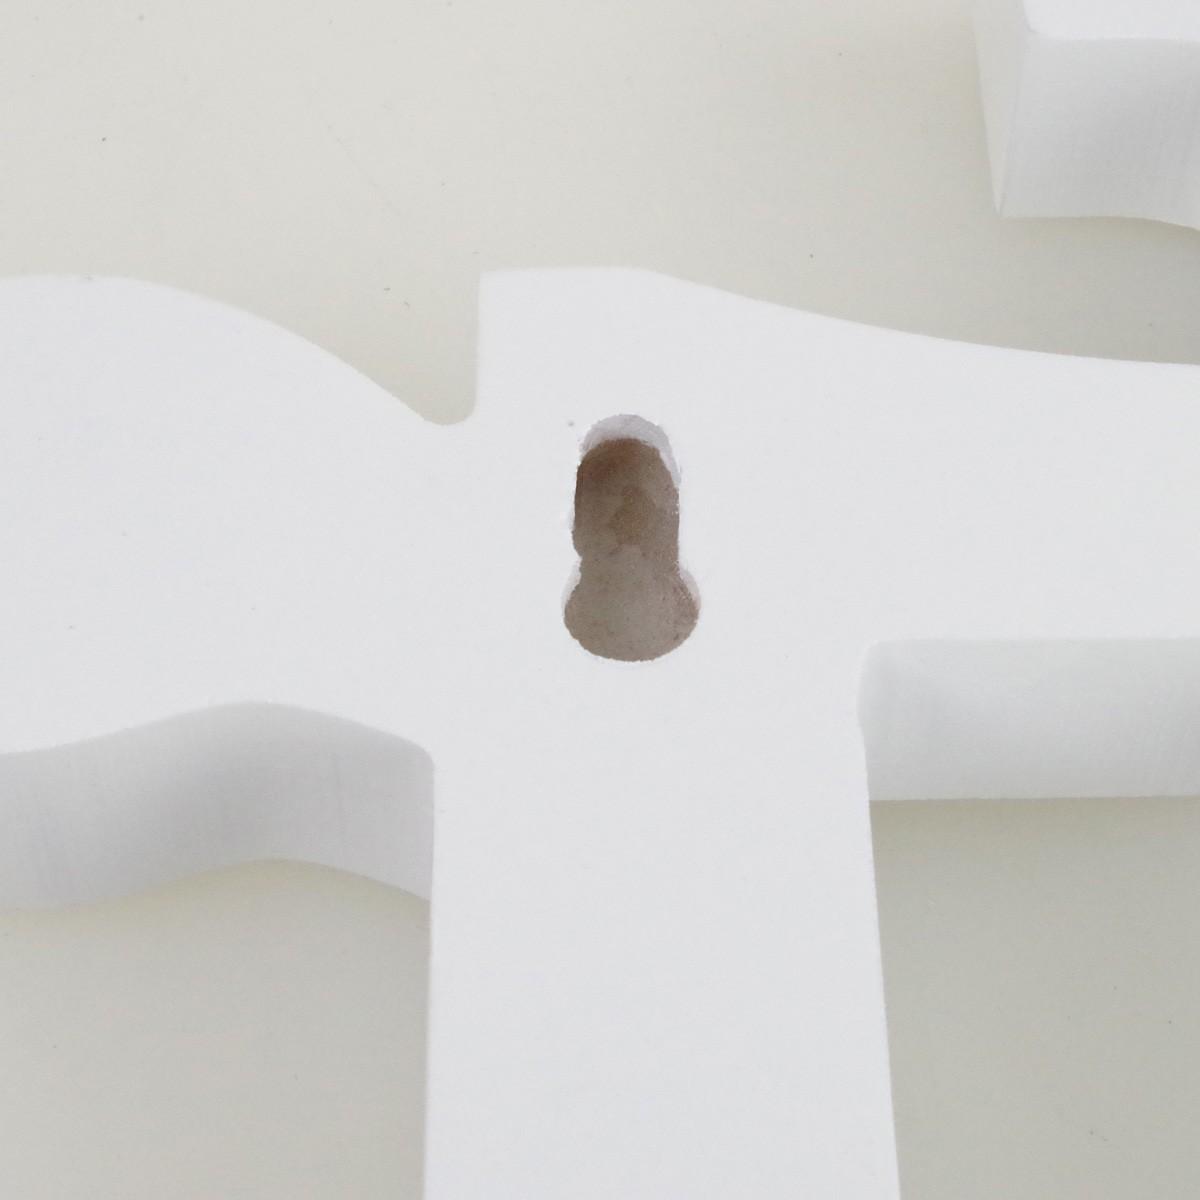 wanddeko deko schriftzug mr weiss 30 5x16 8x2cm 3d optik shabby chic tischdeko. Black Bedroom Furniture Sets. Home Design Ideas